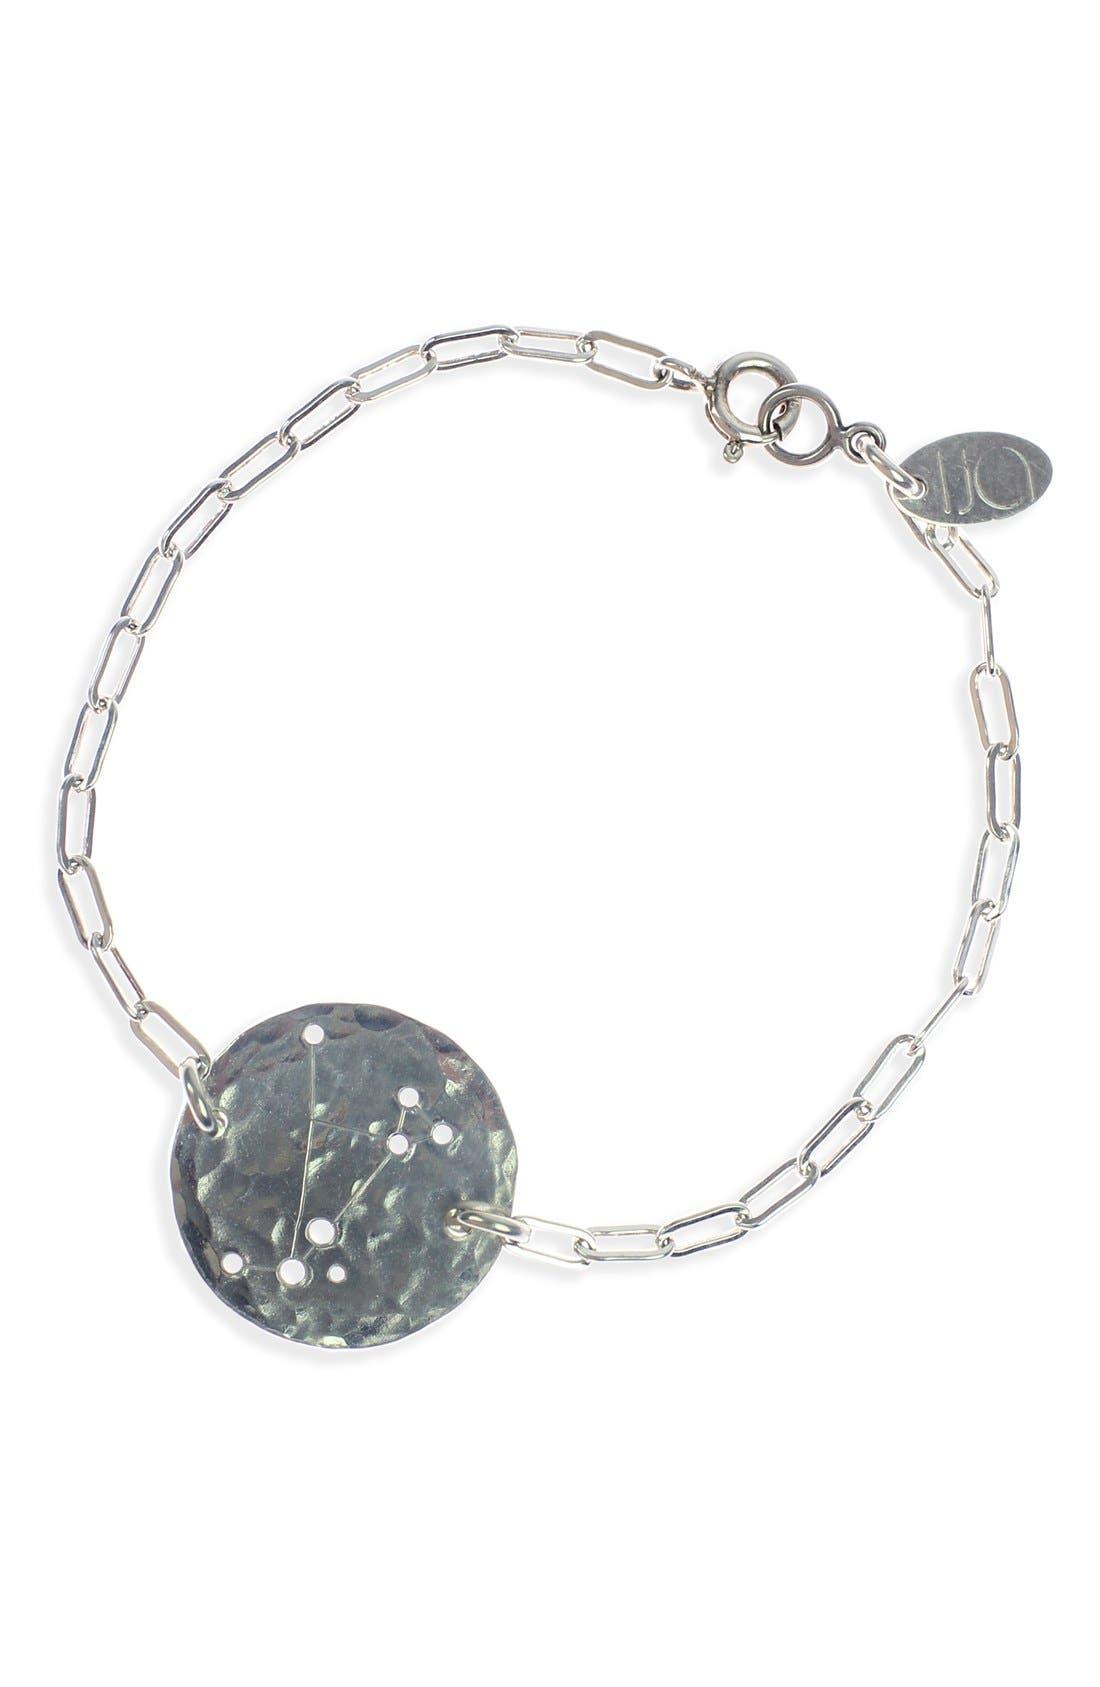 Ija 'Zodiac' Sterling Silver Chain Bracelet,                             Main thumbnail 1, color,                             040